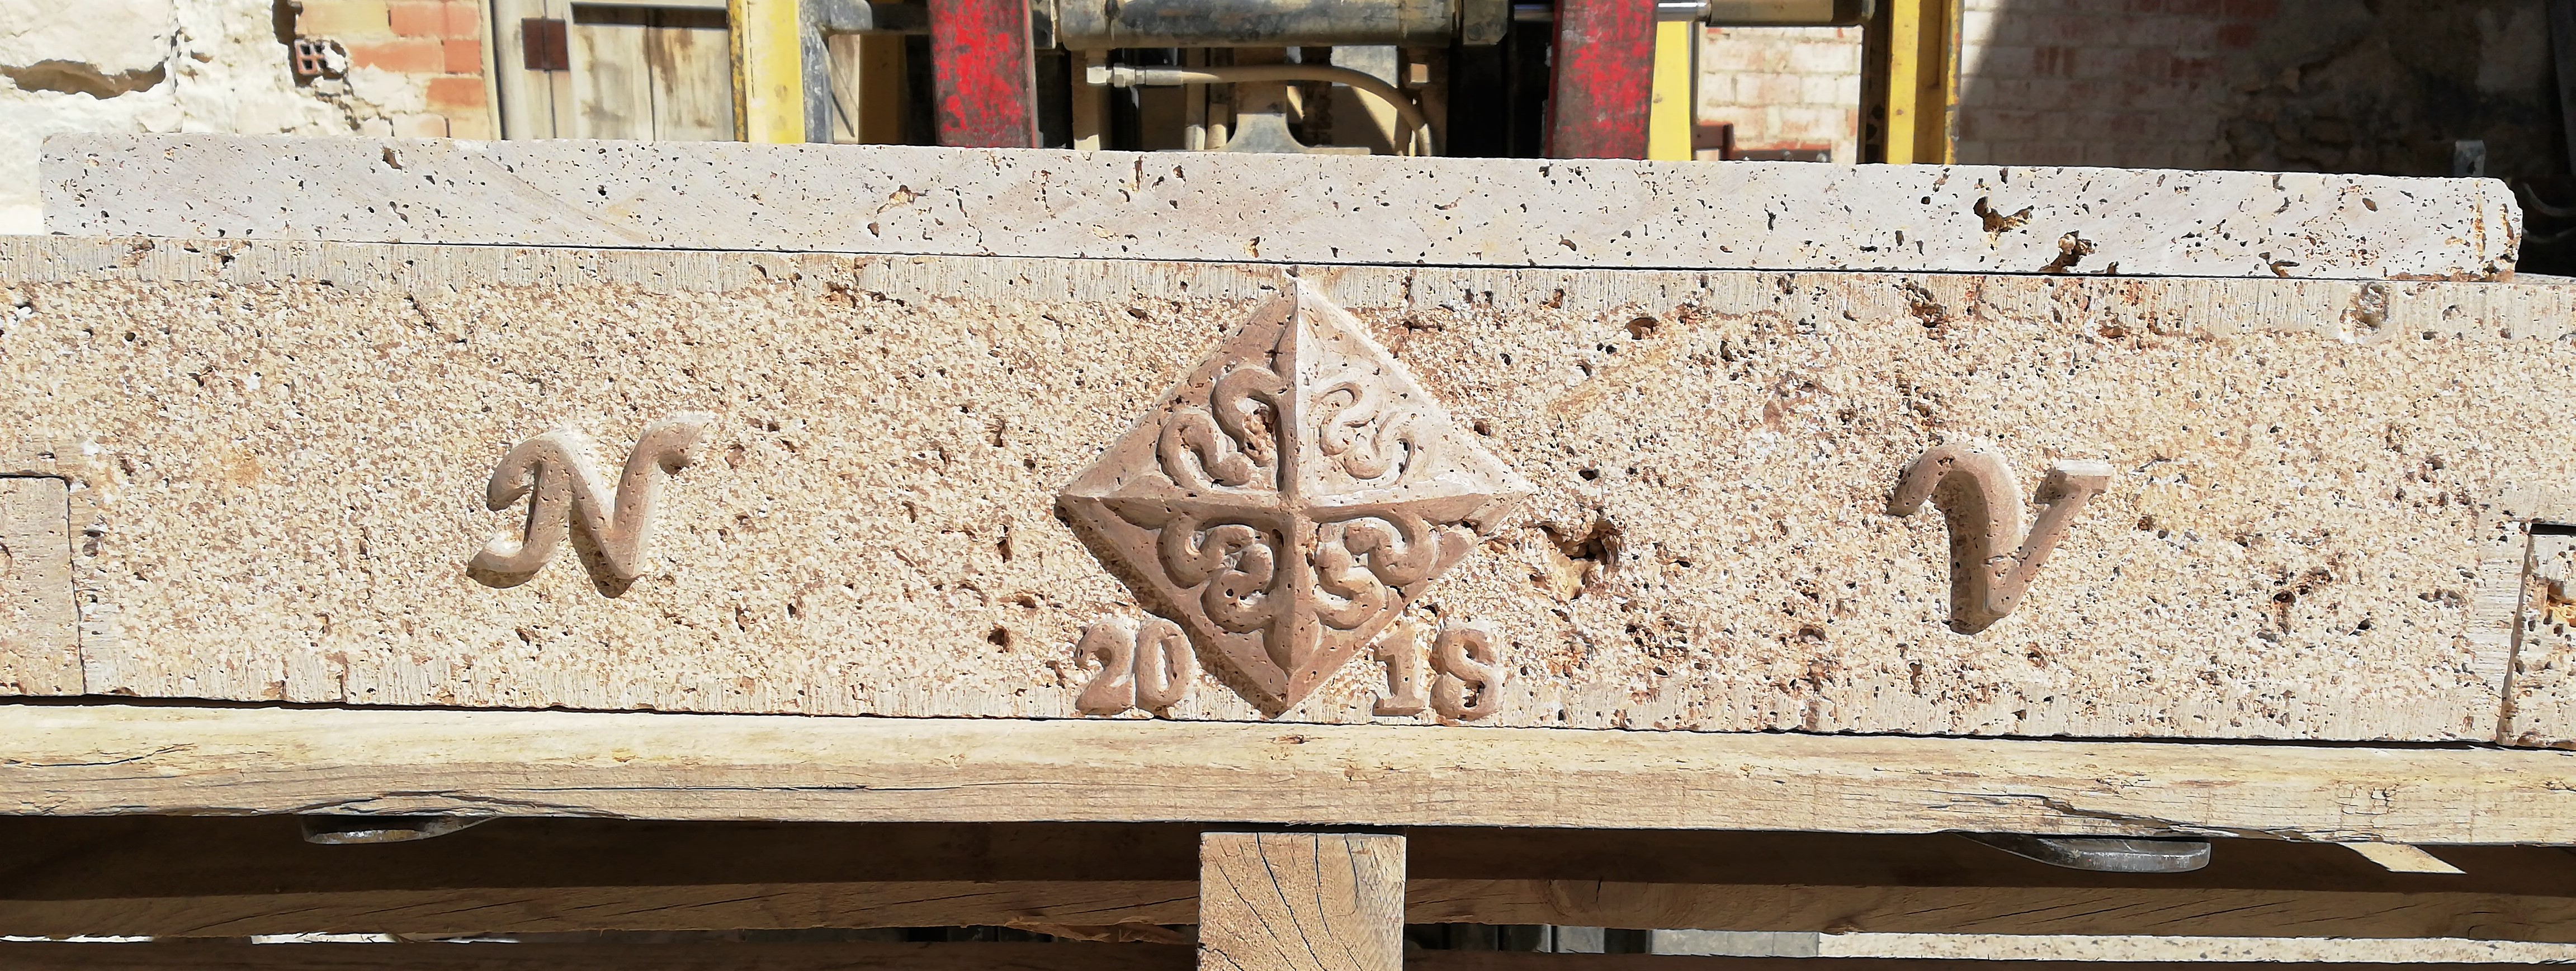 Chimenea alcantara-piedra-artesanía-tall